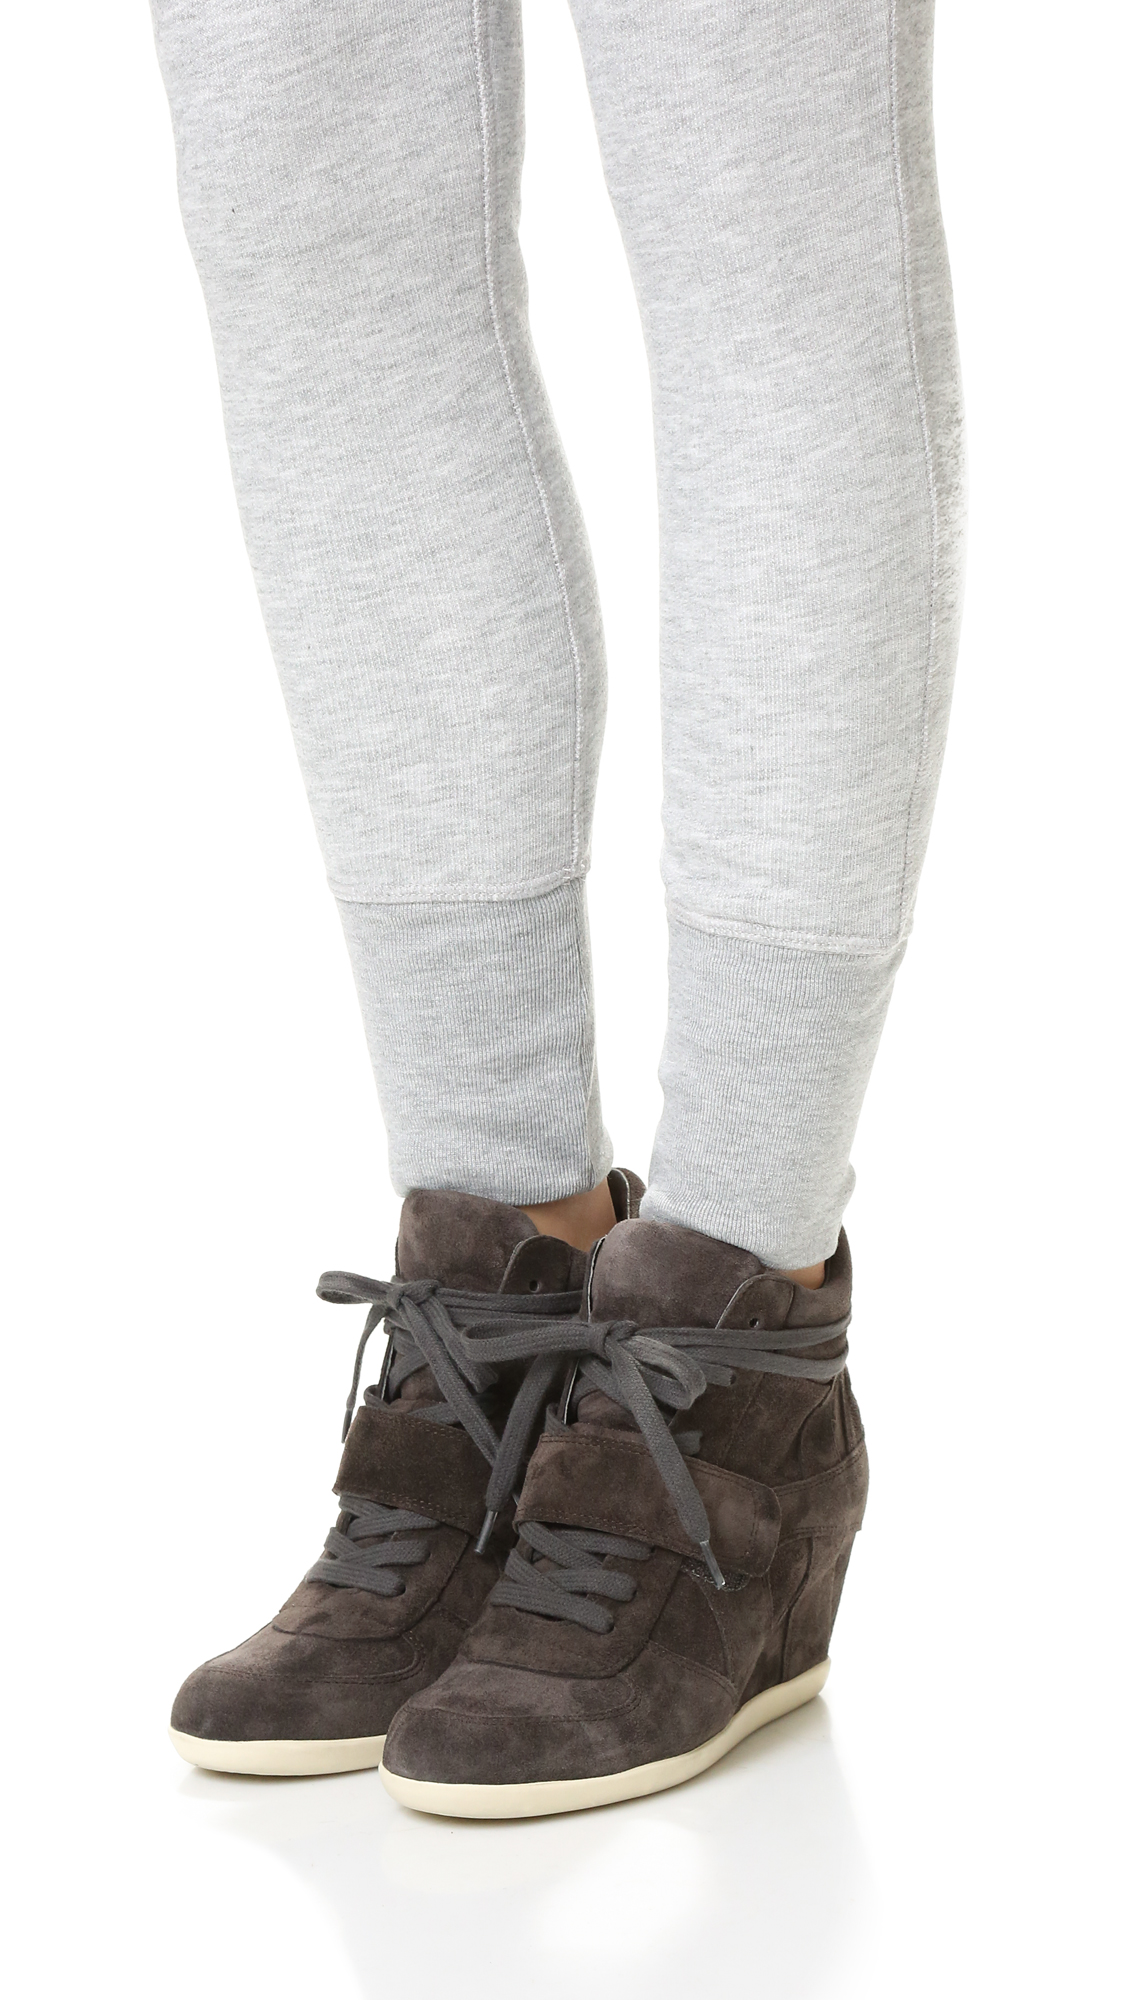 177b09fce860c Ash Bowie Wedge Sneakers